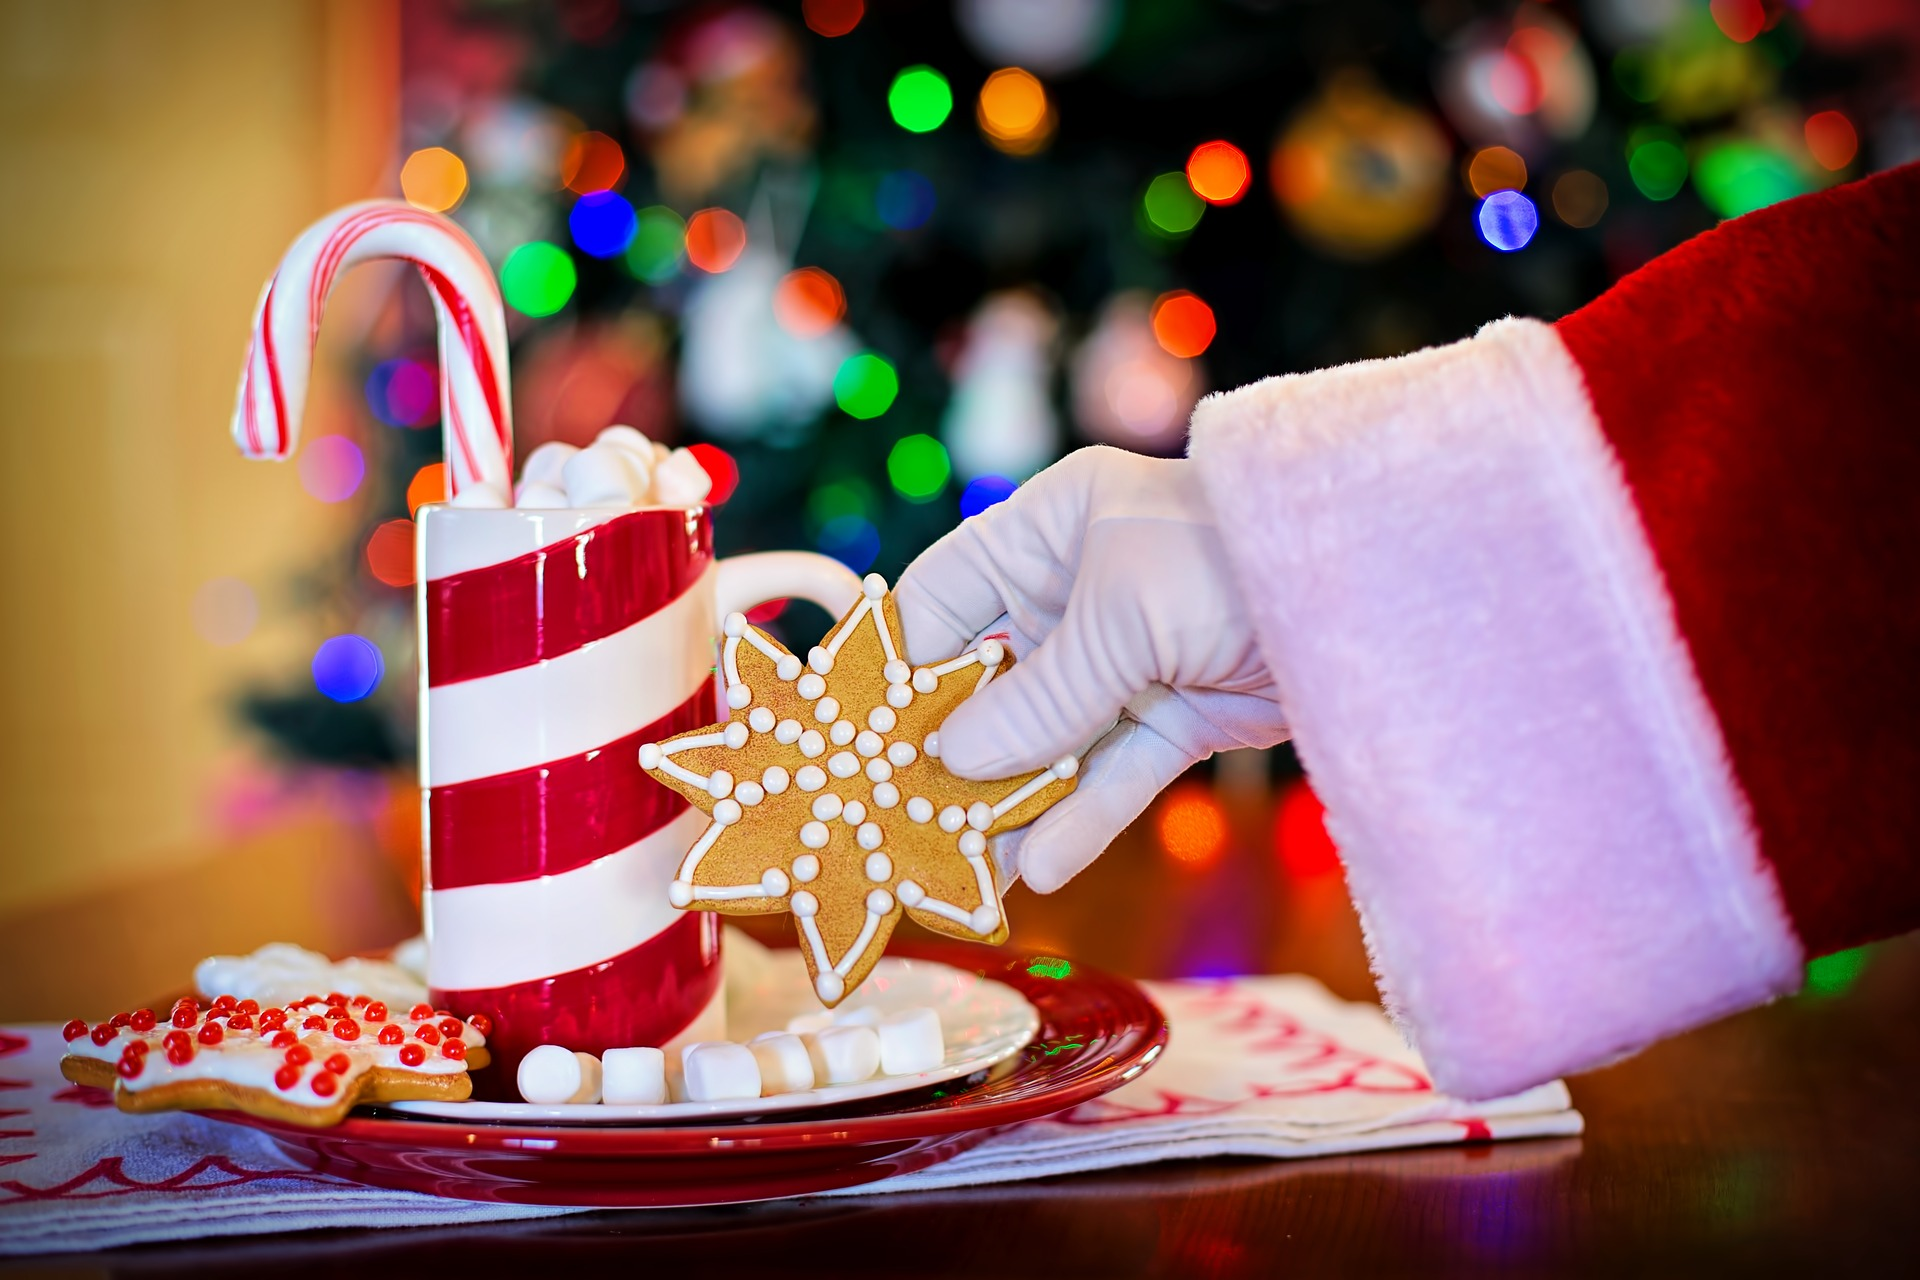 santa's arm holding cookies & hot chocolate